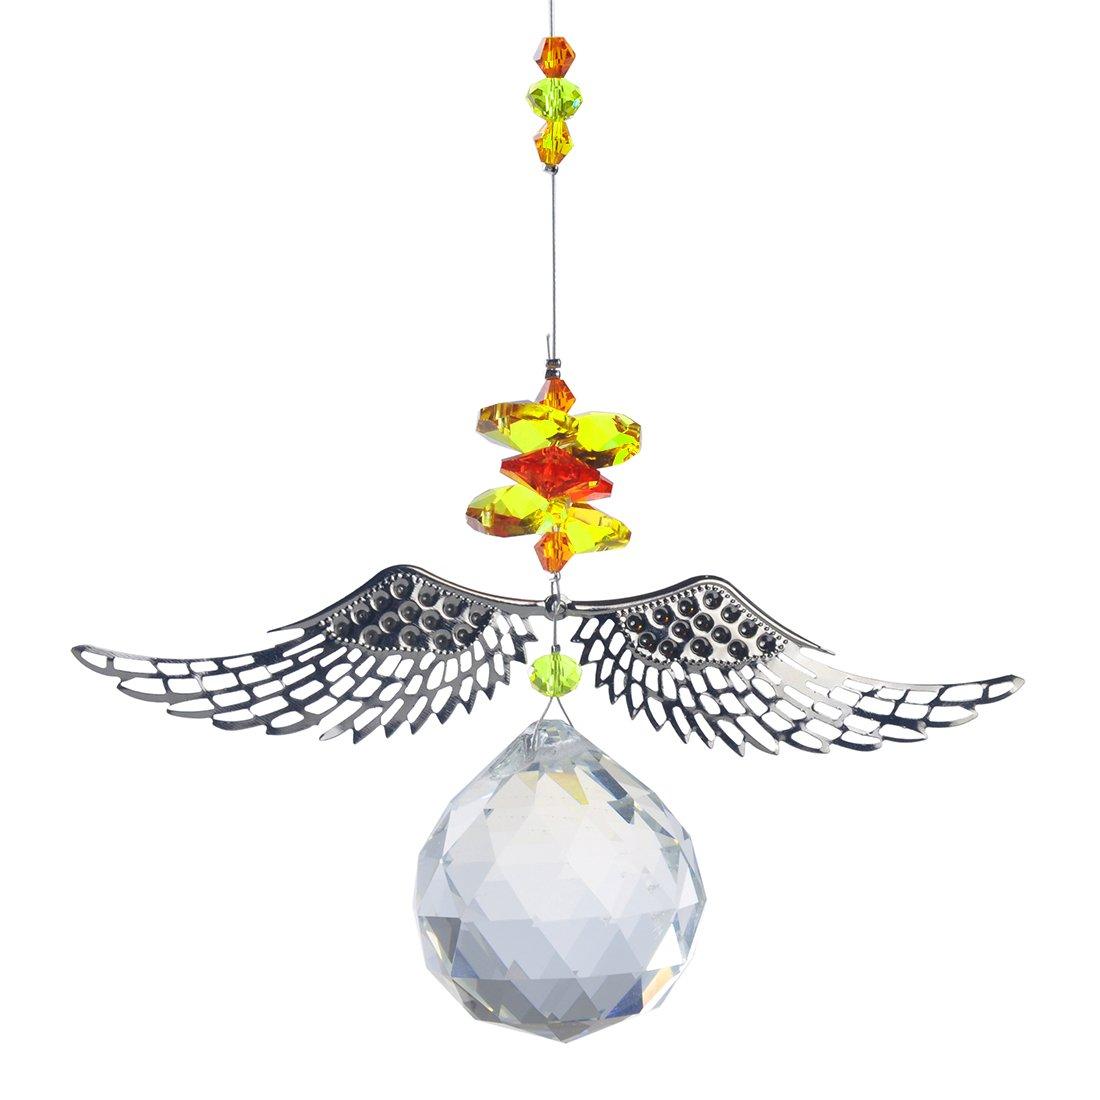 H&D 40 mm Handmade Angle Wings Crystal Ball Prism Rainbow Maker Hanging Suncatcher Home Wedding Decoration